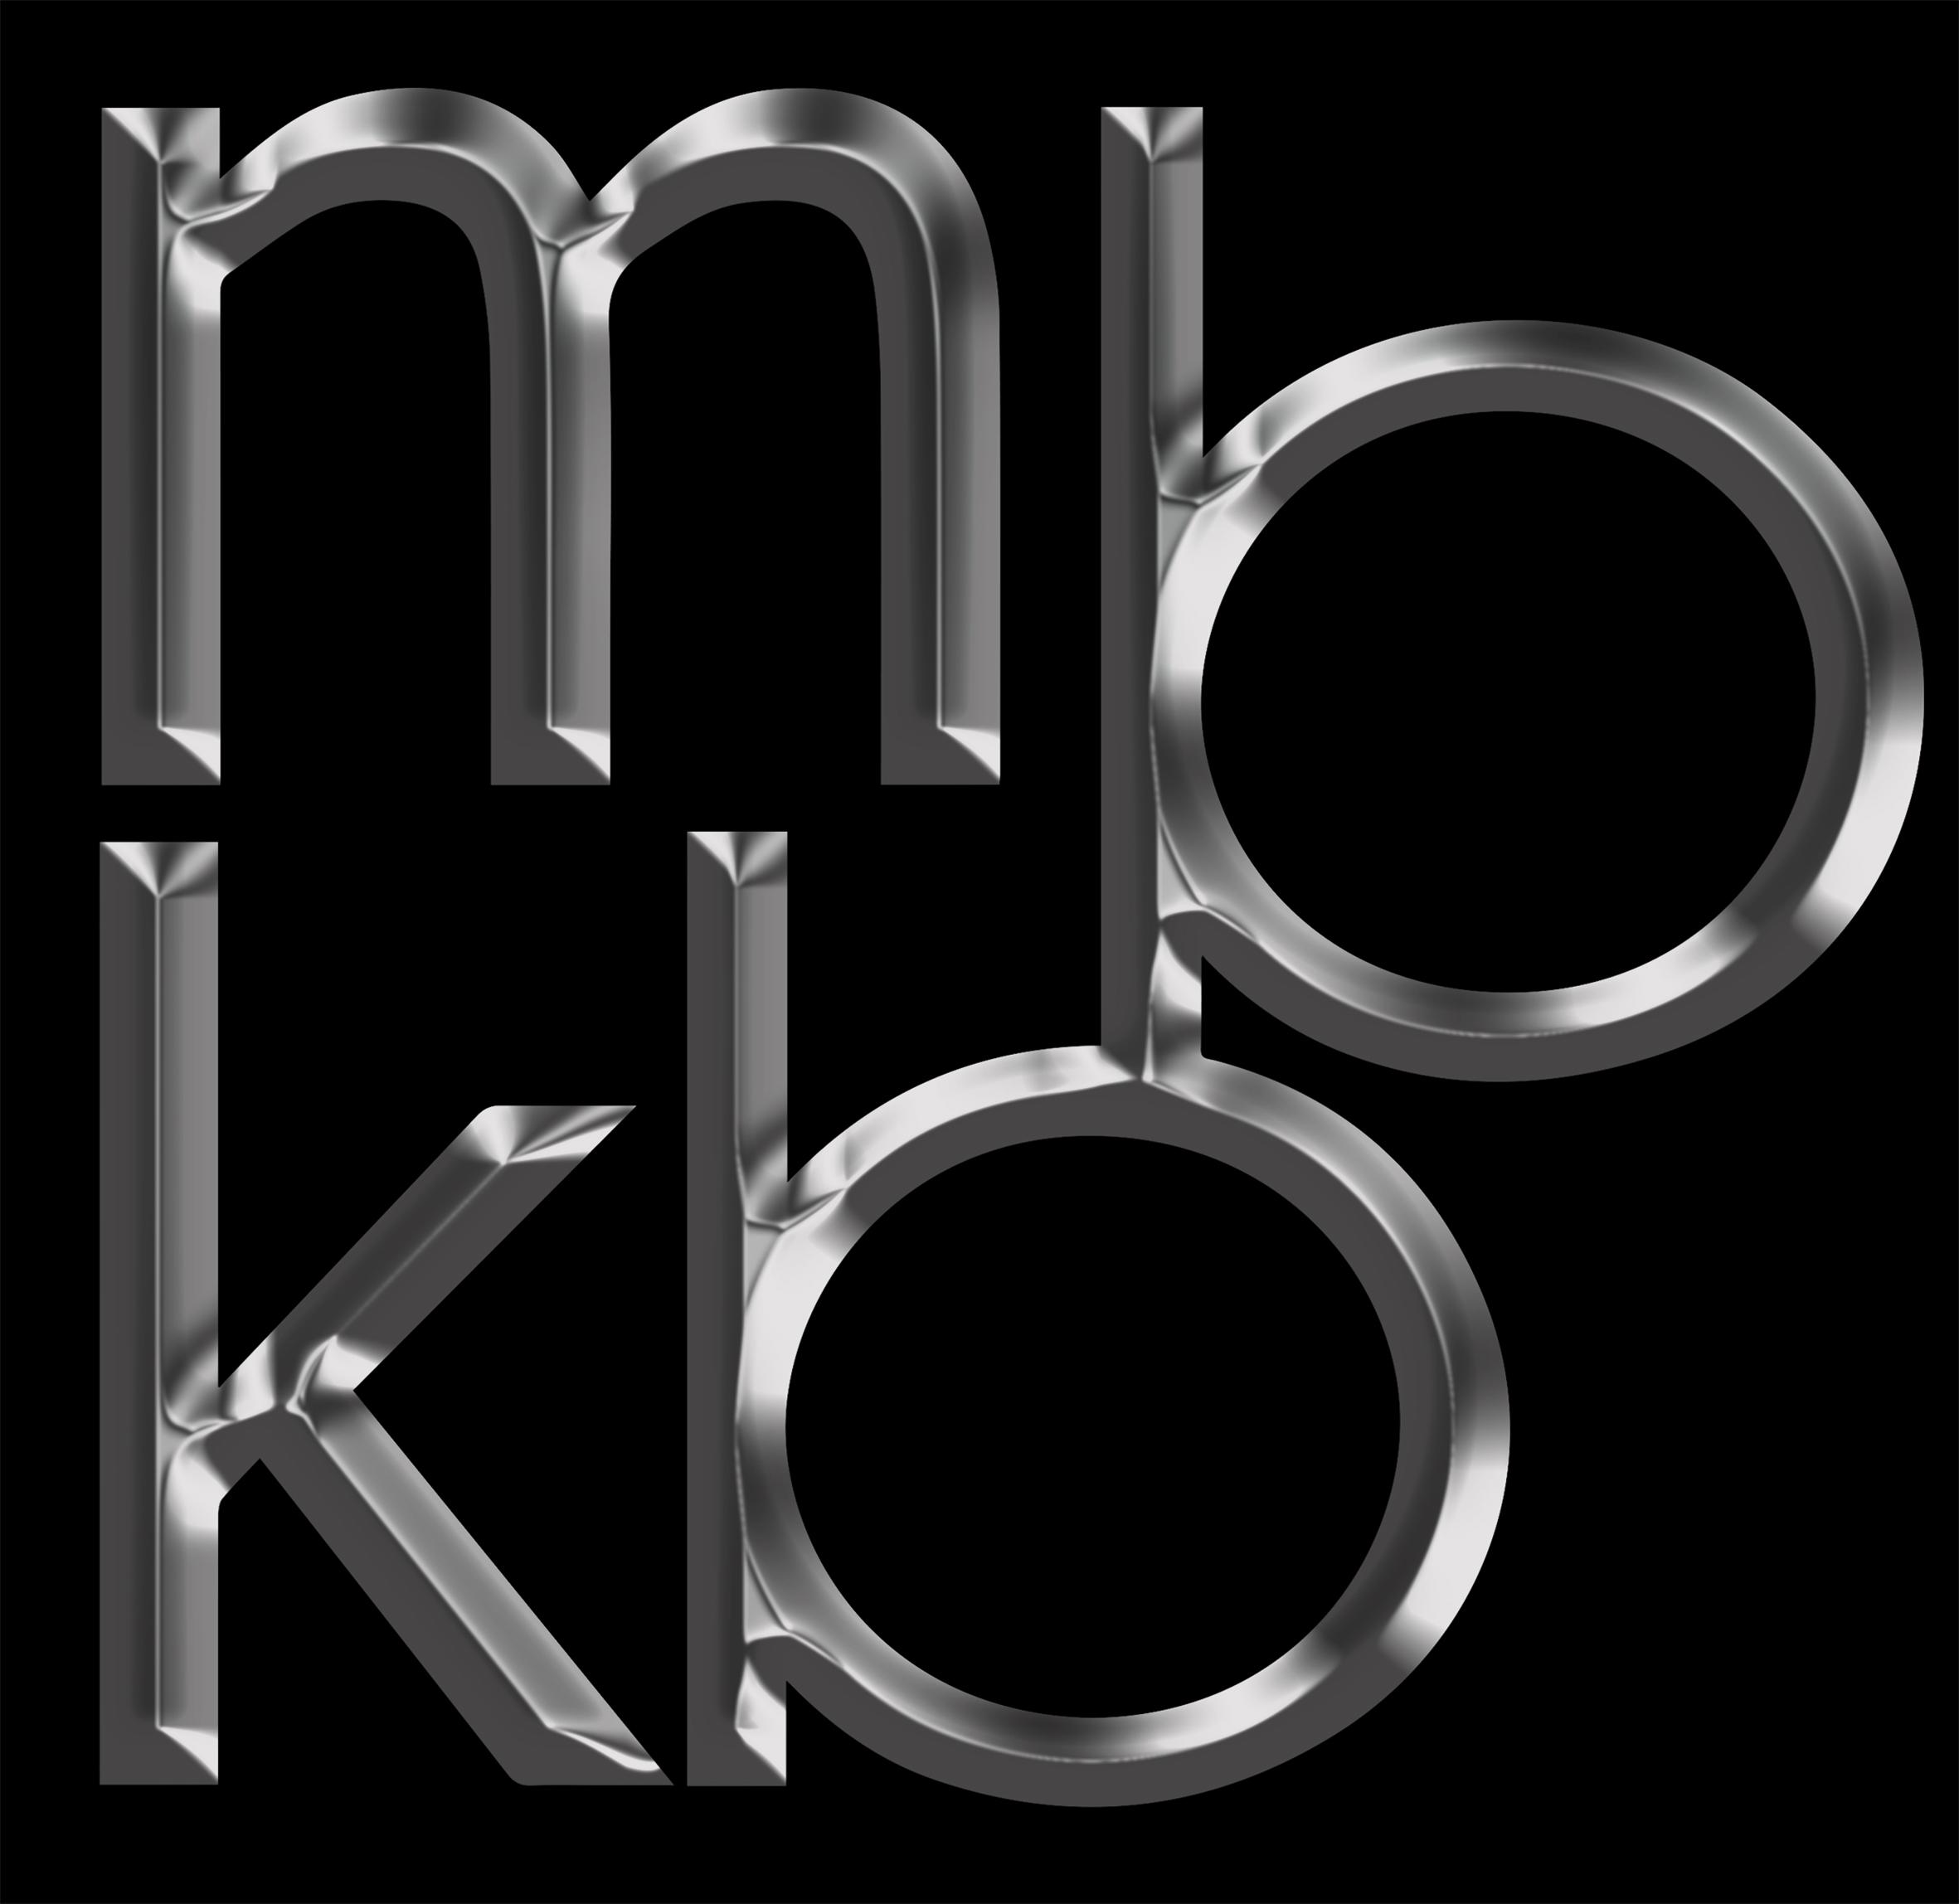 mbkb provider logo